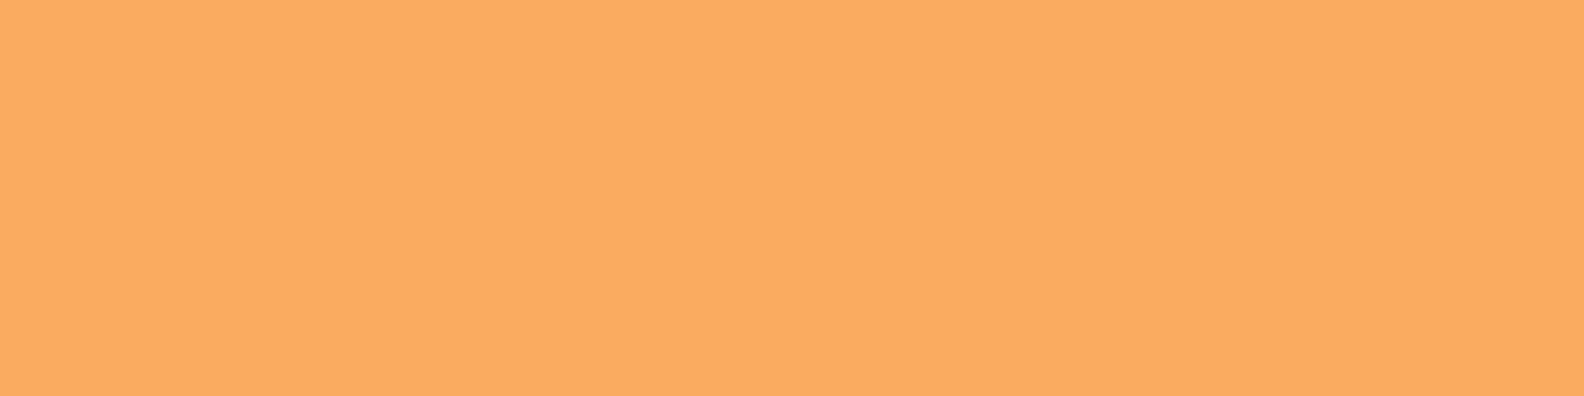 1584x396 Rajah Solid Color Background